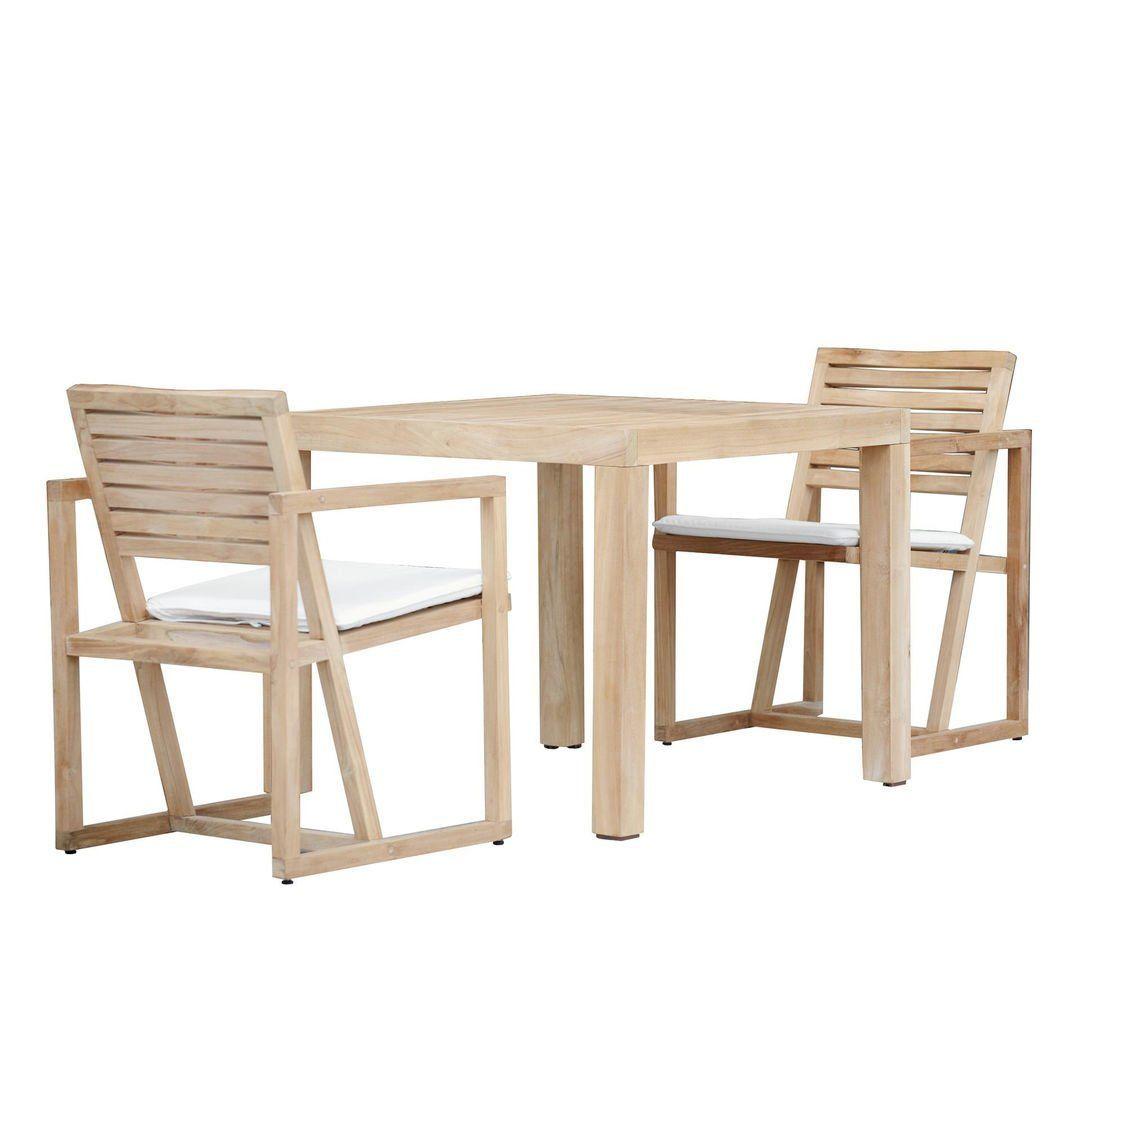 Timber teakholz gartenm bel set jan kurtz - Teakholz gartenmobel ...